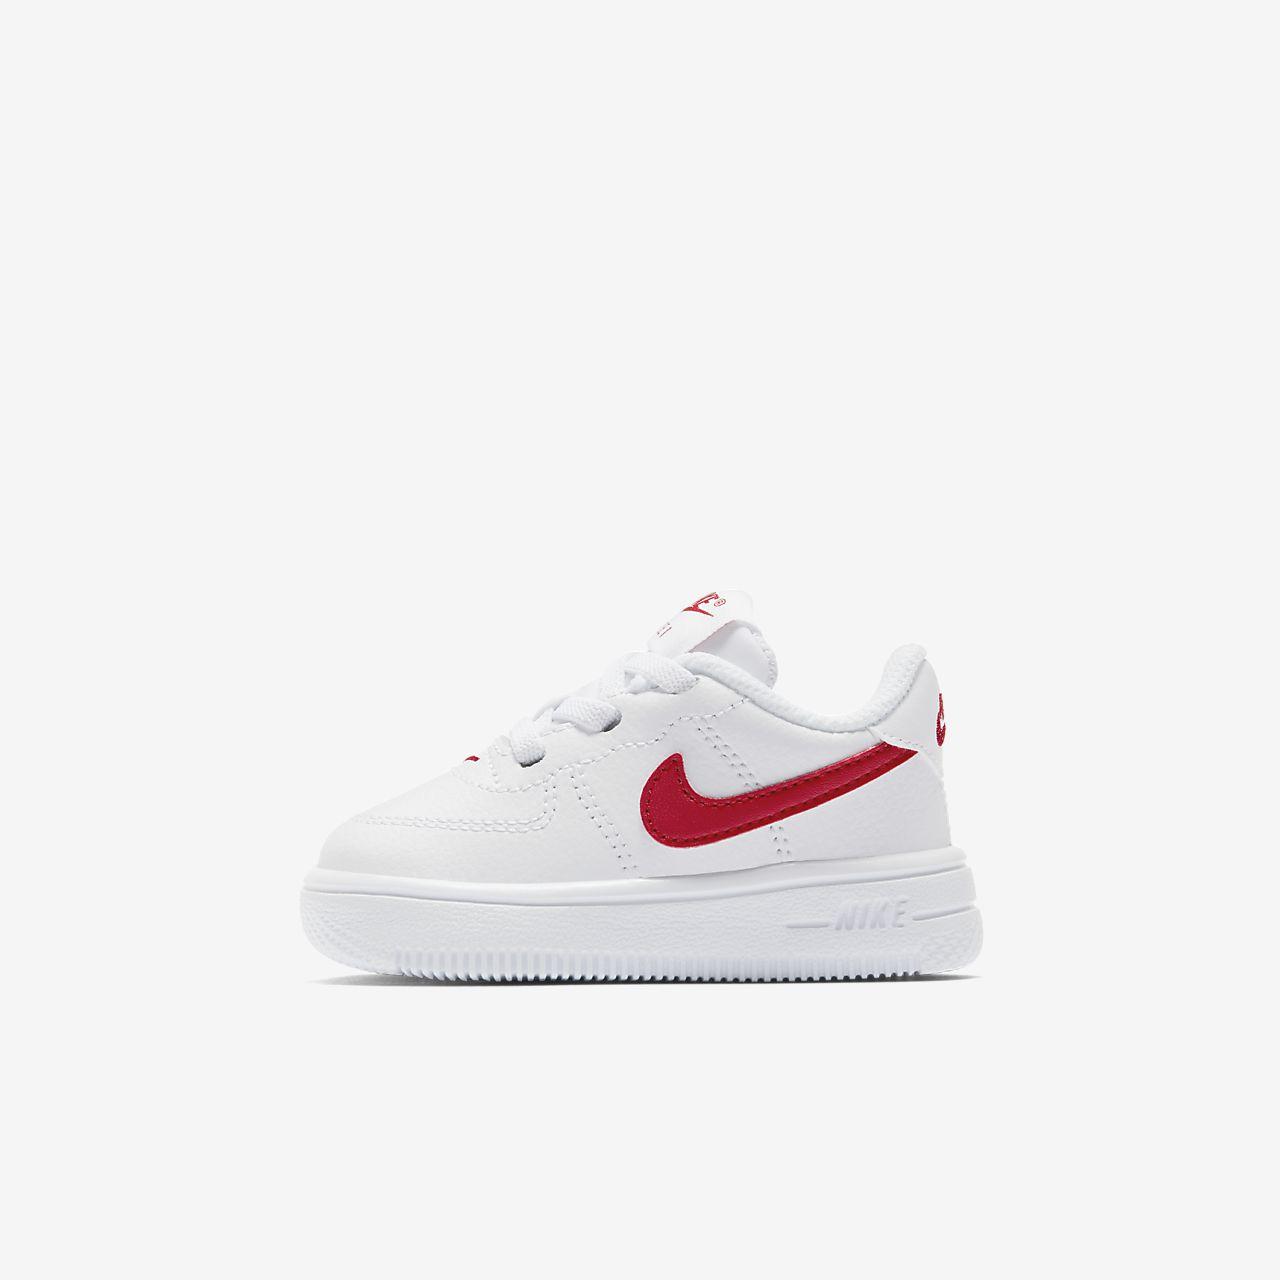 Chaussure Nike Air Force 1 iD pour Petit enfant